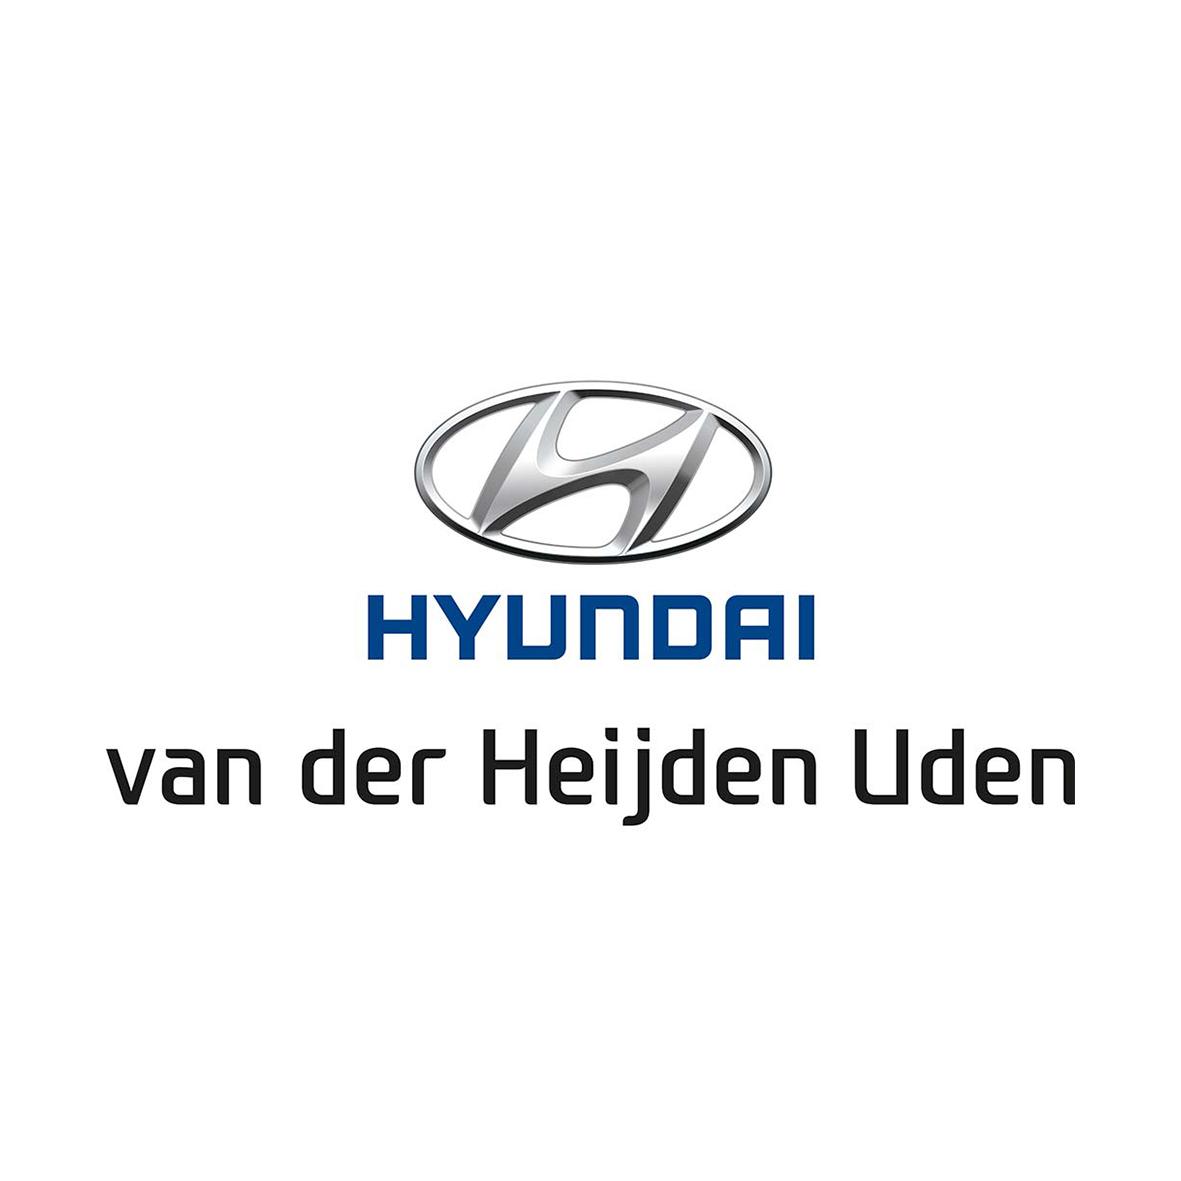 Hyundai_vdHeijden